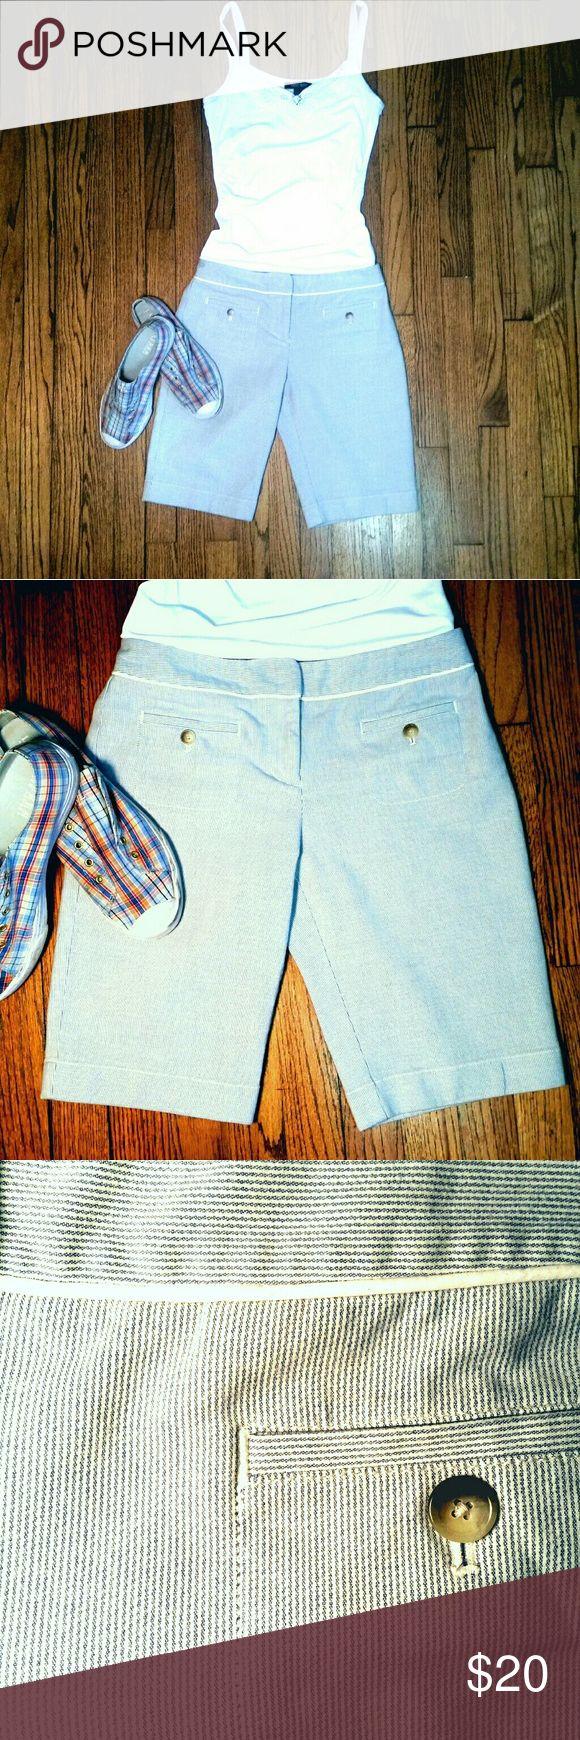 "Ann Taylor Pinstriped Shorts Blue and white mattress ticking pinstripe shorts by Ann Taylor. Flat front, front slash pockets, 2 back pockets, inseam 11"". Ann Taylor Shorts Bermudas"